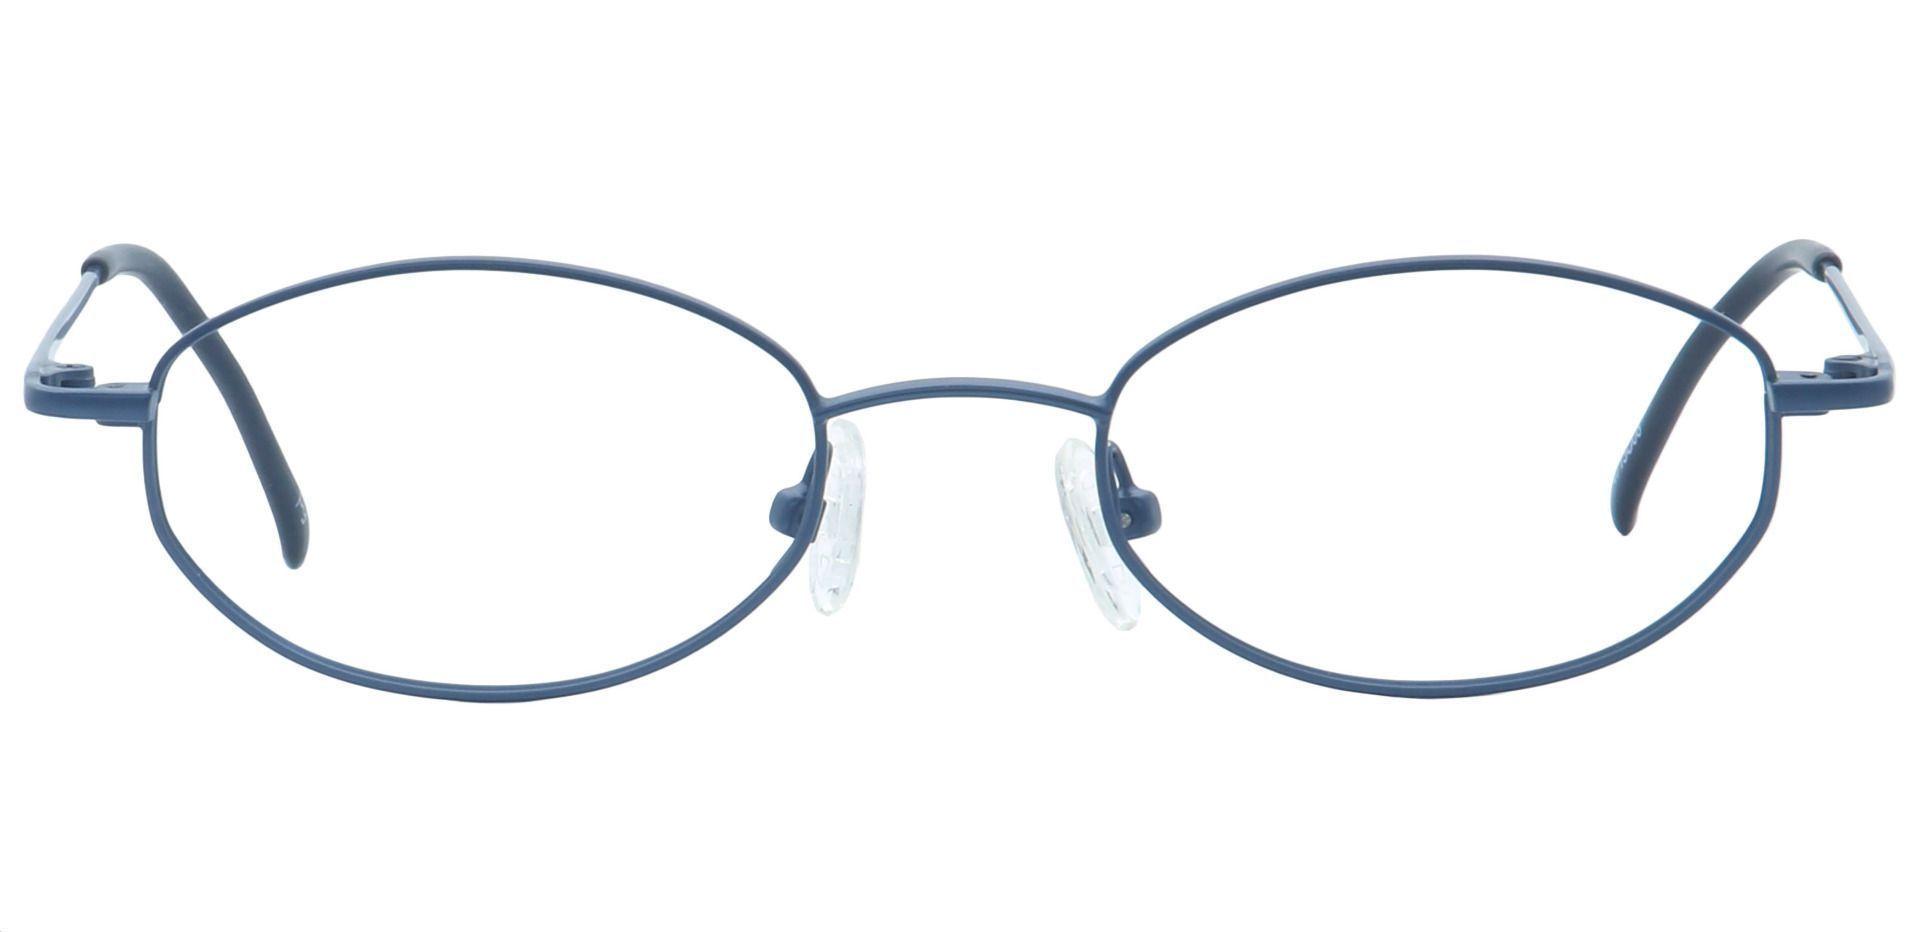 Bailey Oval Eyeglasses Frame - Blue